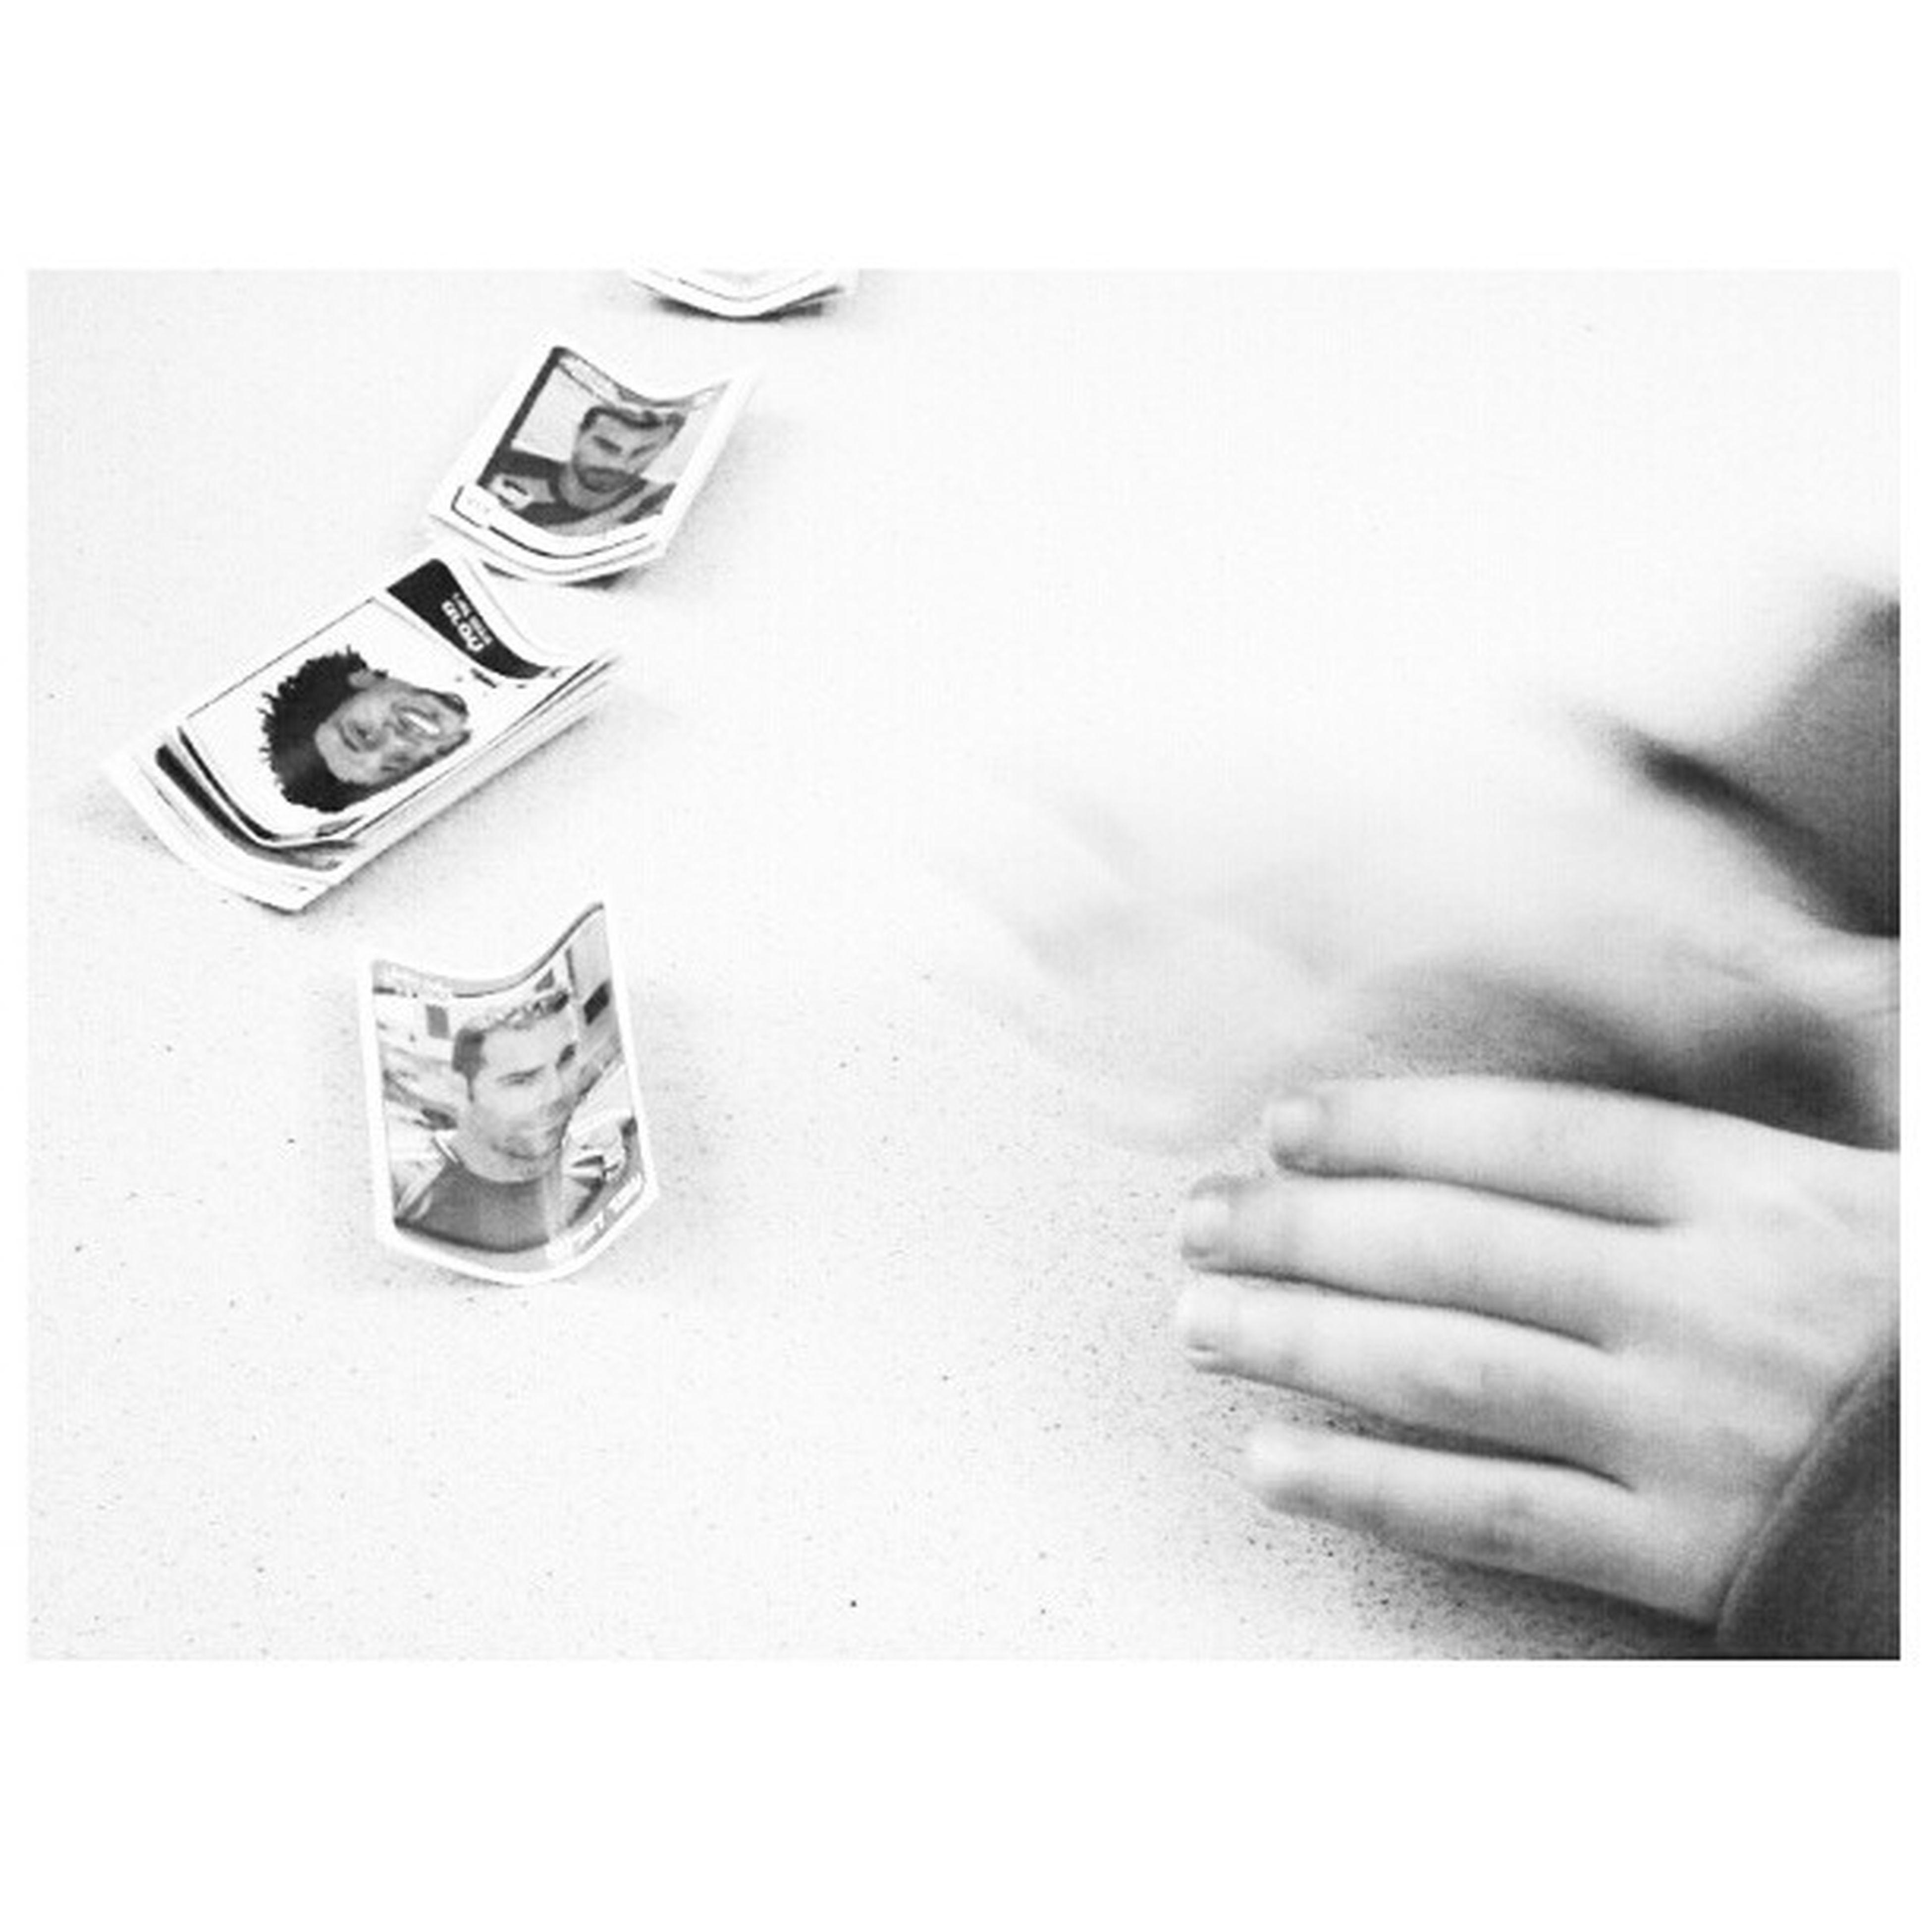 Supergol Hit Motion BlurOnPurpose blackandwhite cards football bw bwstyles_gf bwcenter artphoto_bw lessismore minimalism bandw monoart mono igminimal igersisrael igerisrael_bw ig_photoisrael ig_snapshots ig_israel statigram all_shots instafun